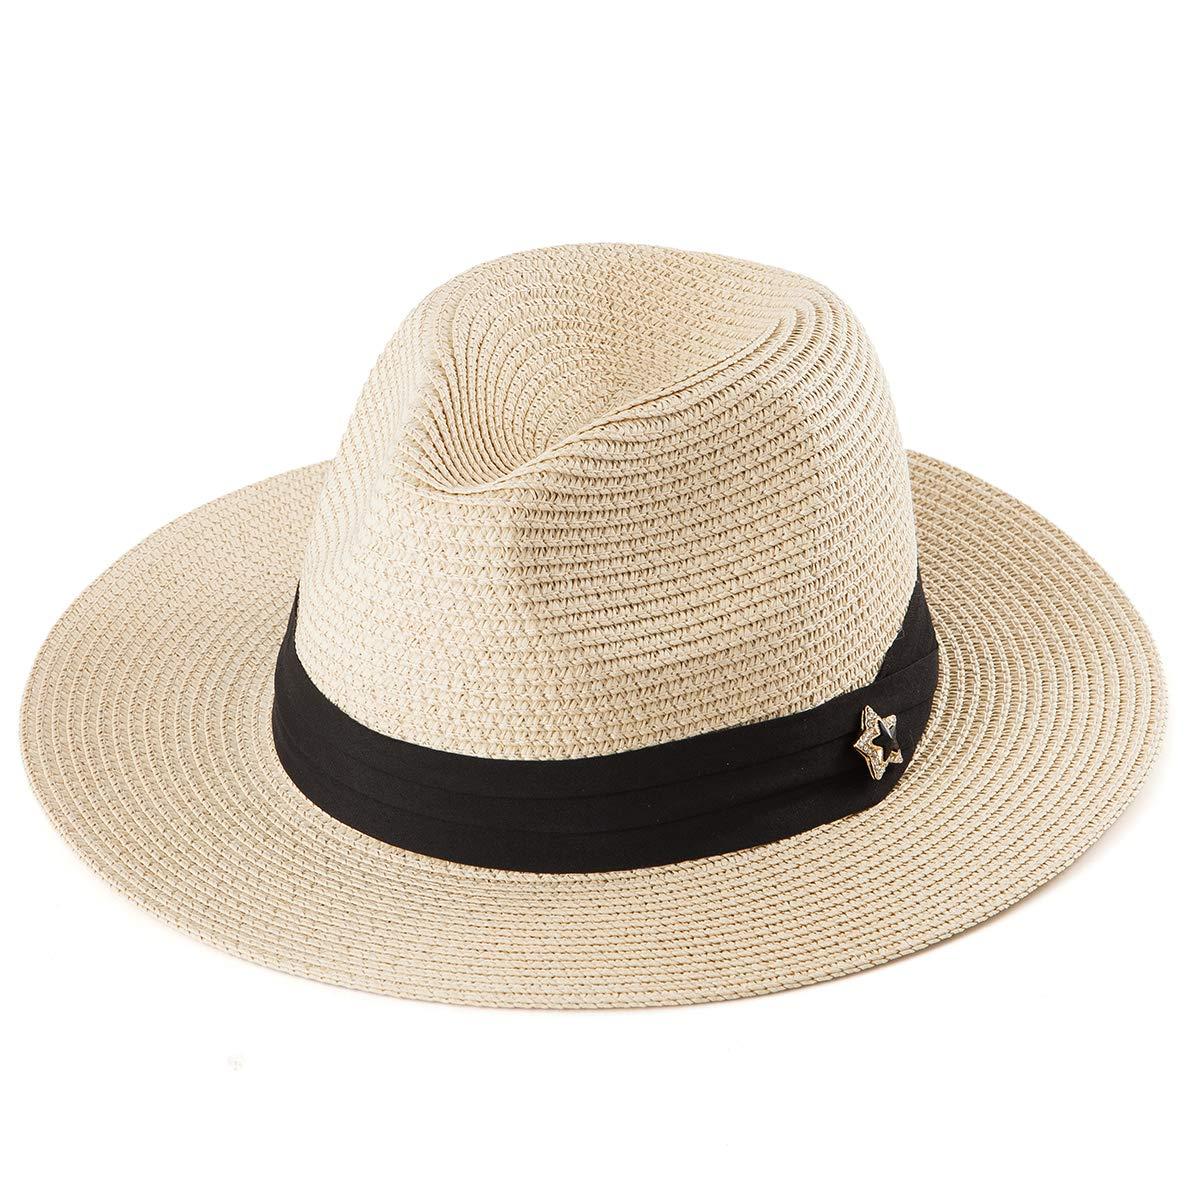 7edd1852 Women Wide Brim Hat Panama - Beige Straw Hat Summer Sun Hat Beach Fedora  Hat Cap at Amazon Women's Clothing store: